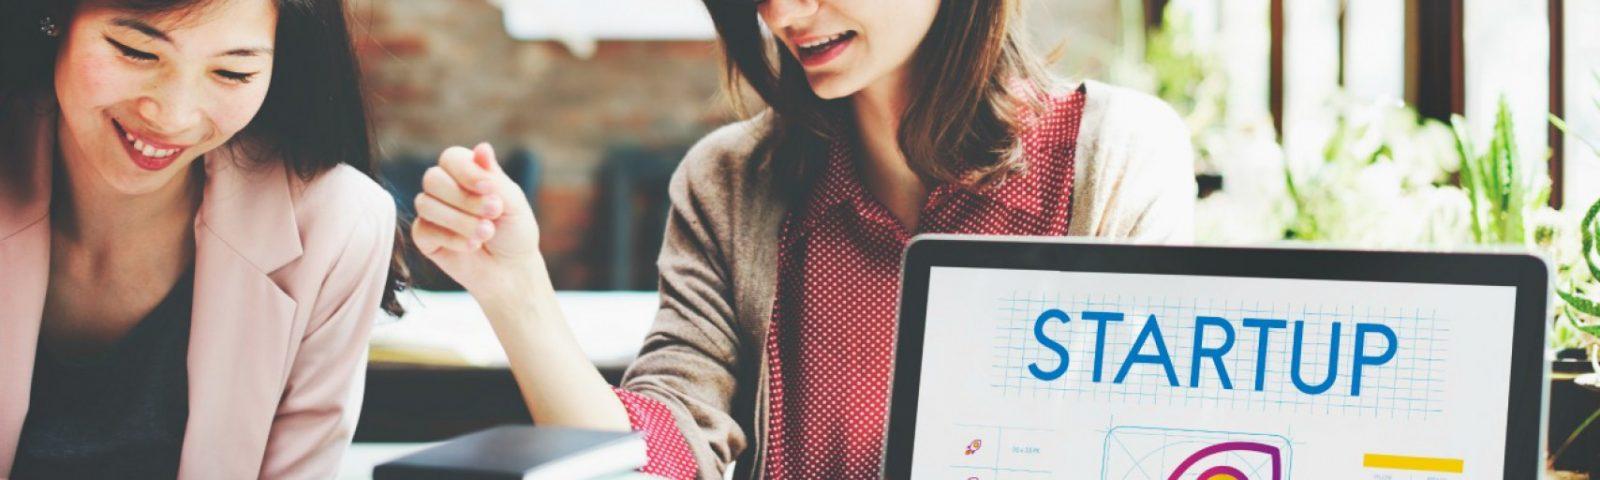 empreendedorismo feminino - Infofranchising